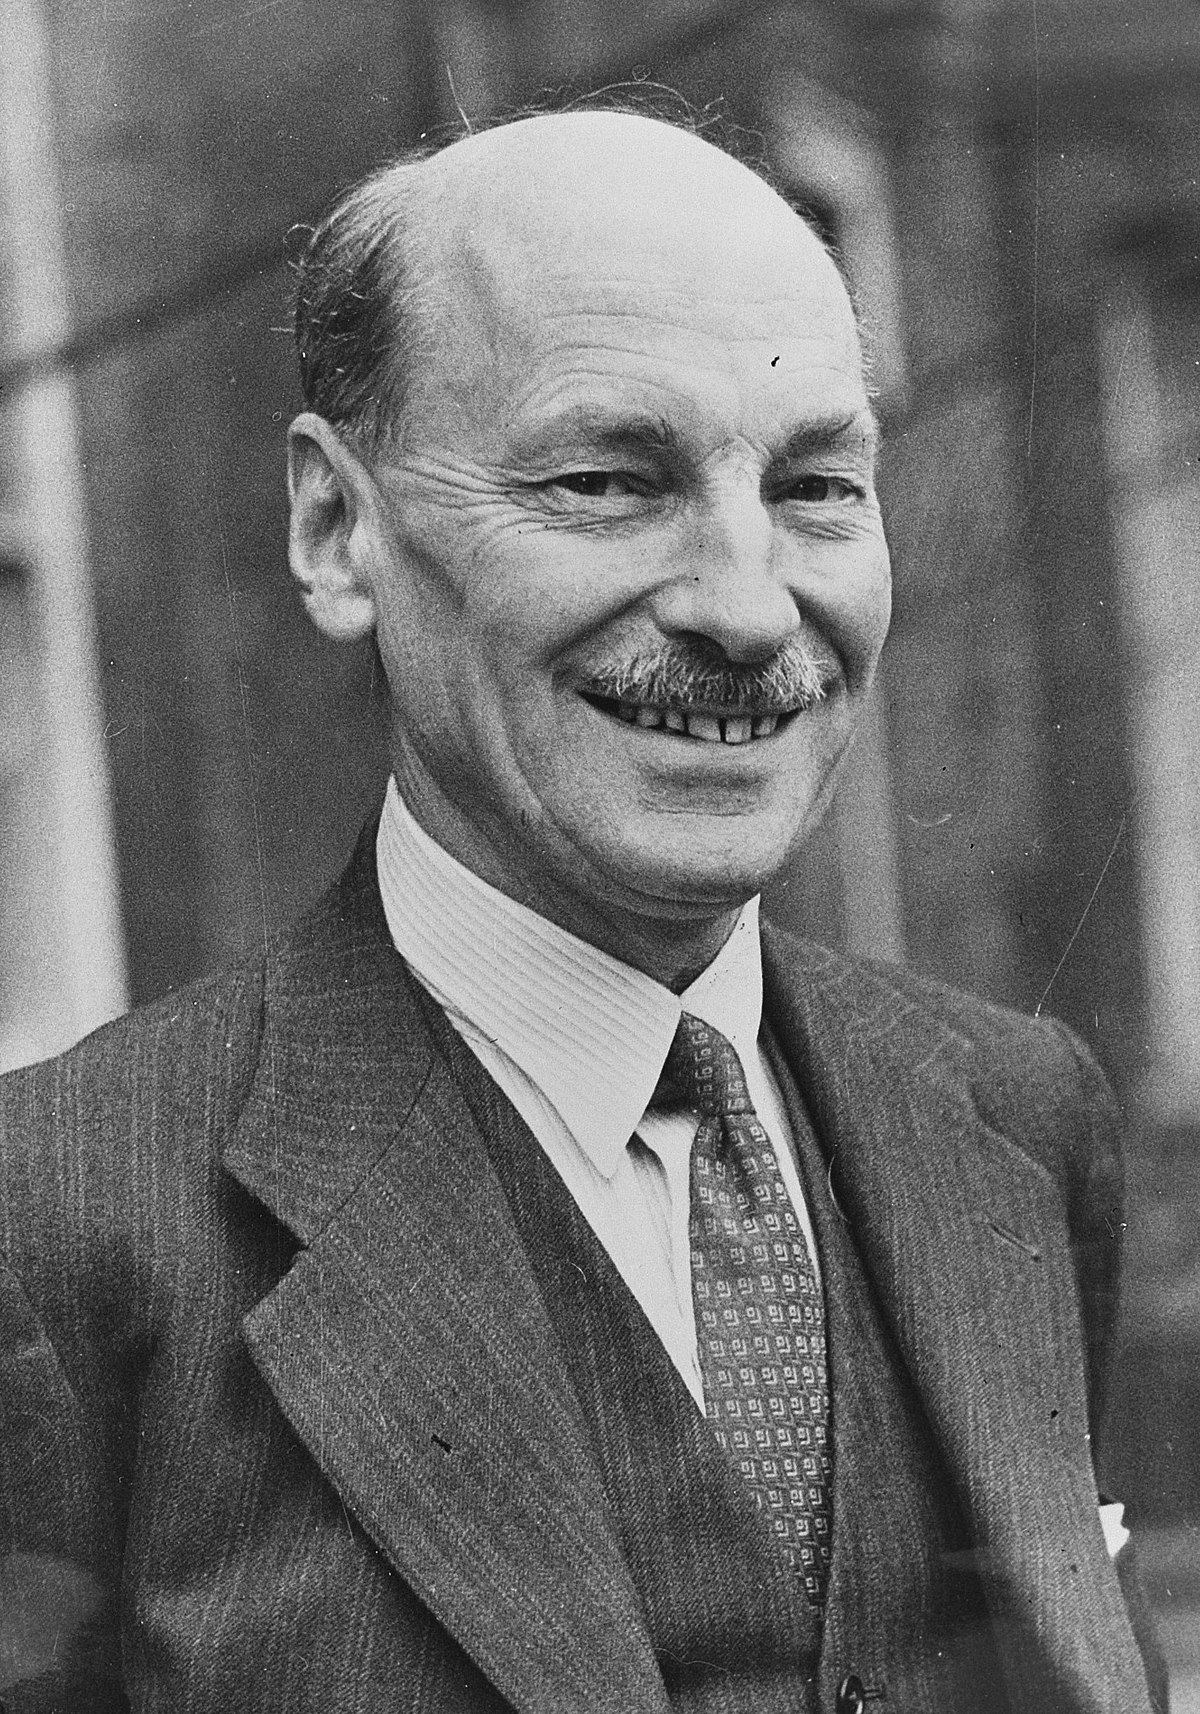 1950 United Kingdom general election - Wikipedia